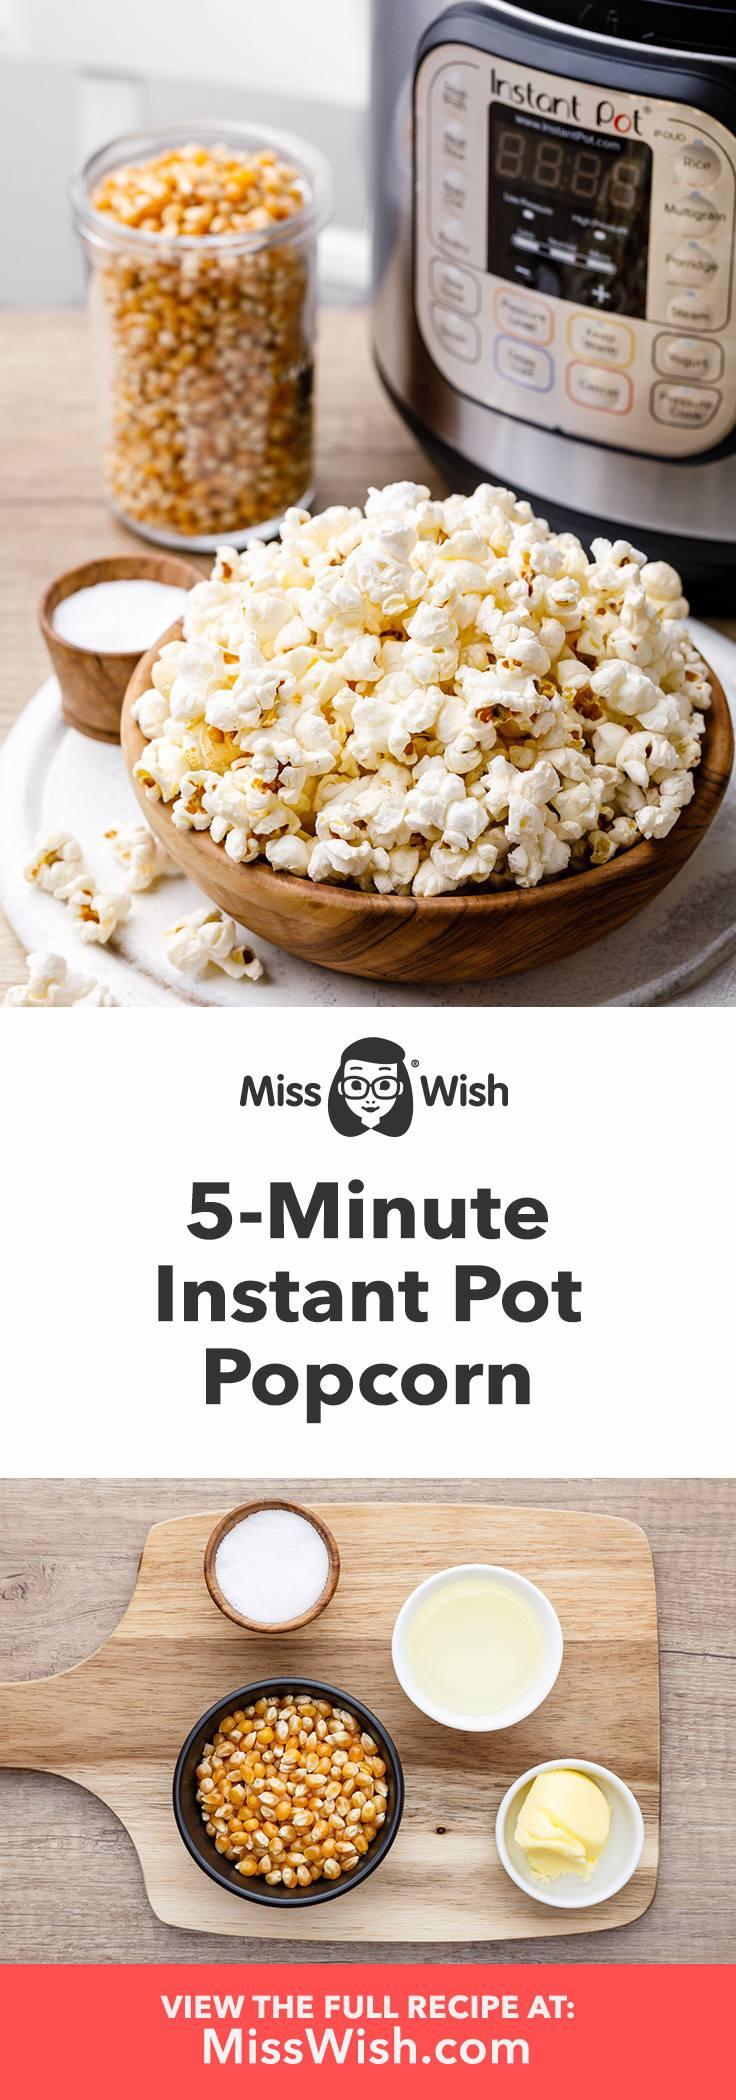 5-Minute Instant Pot Popcorn